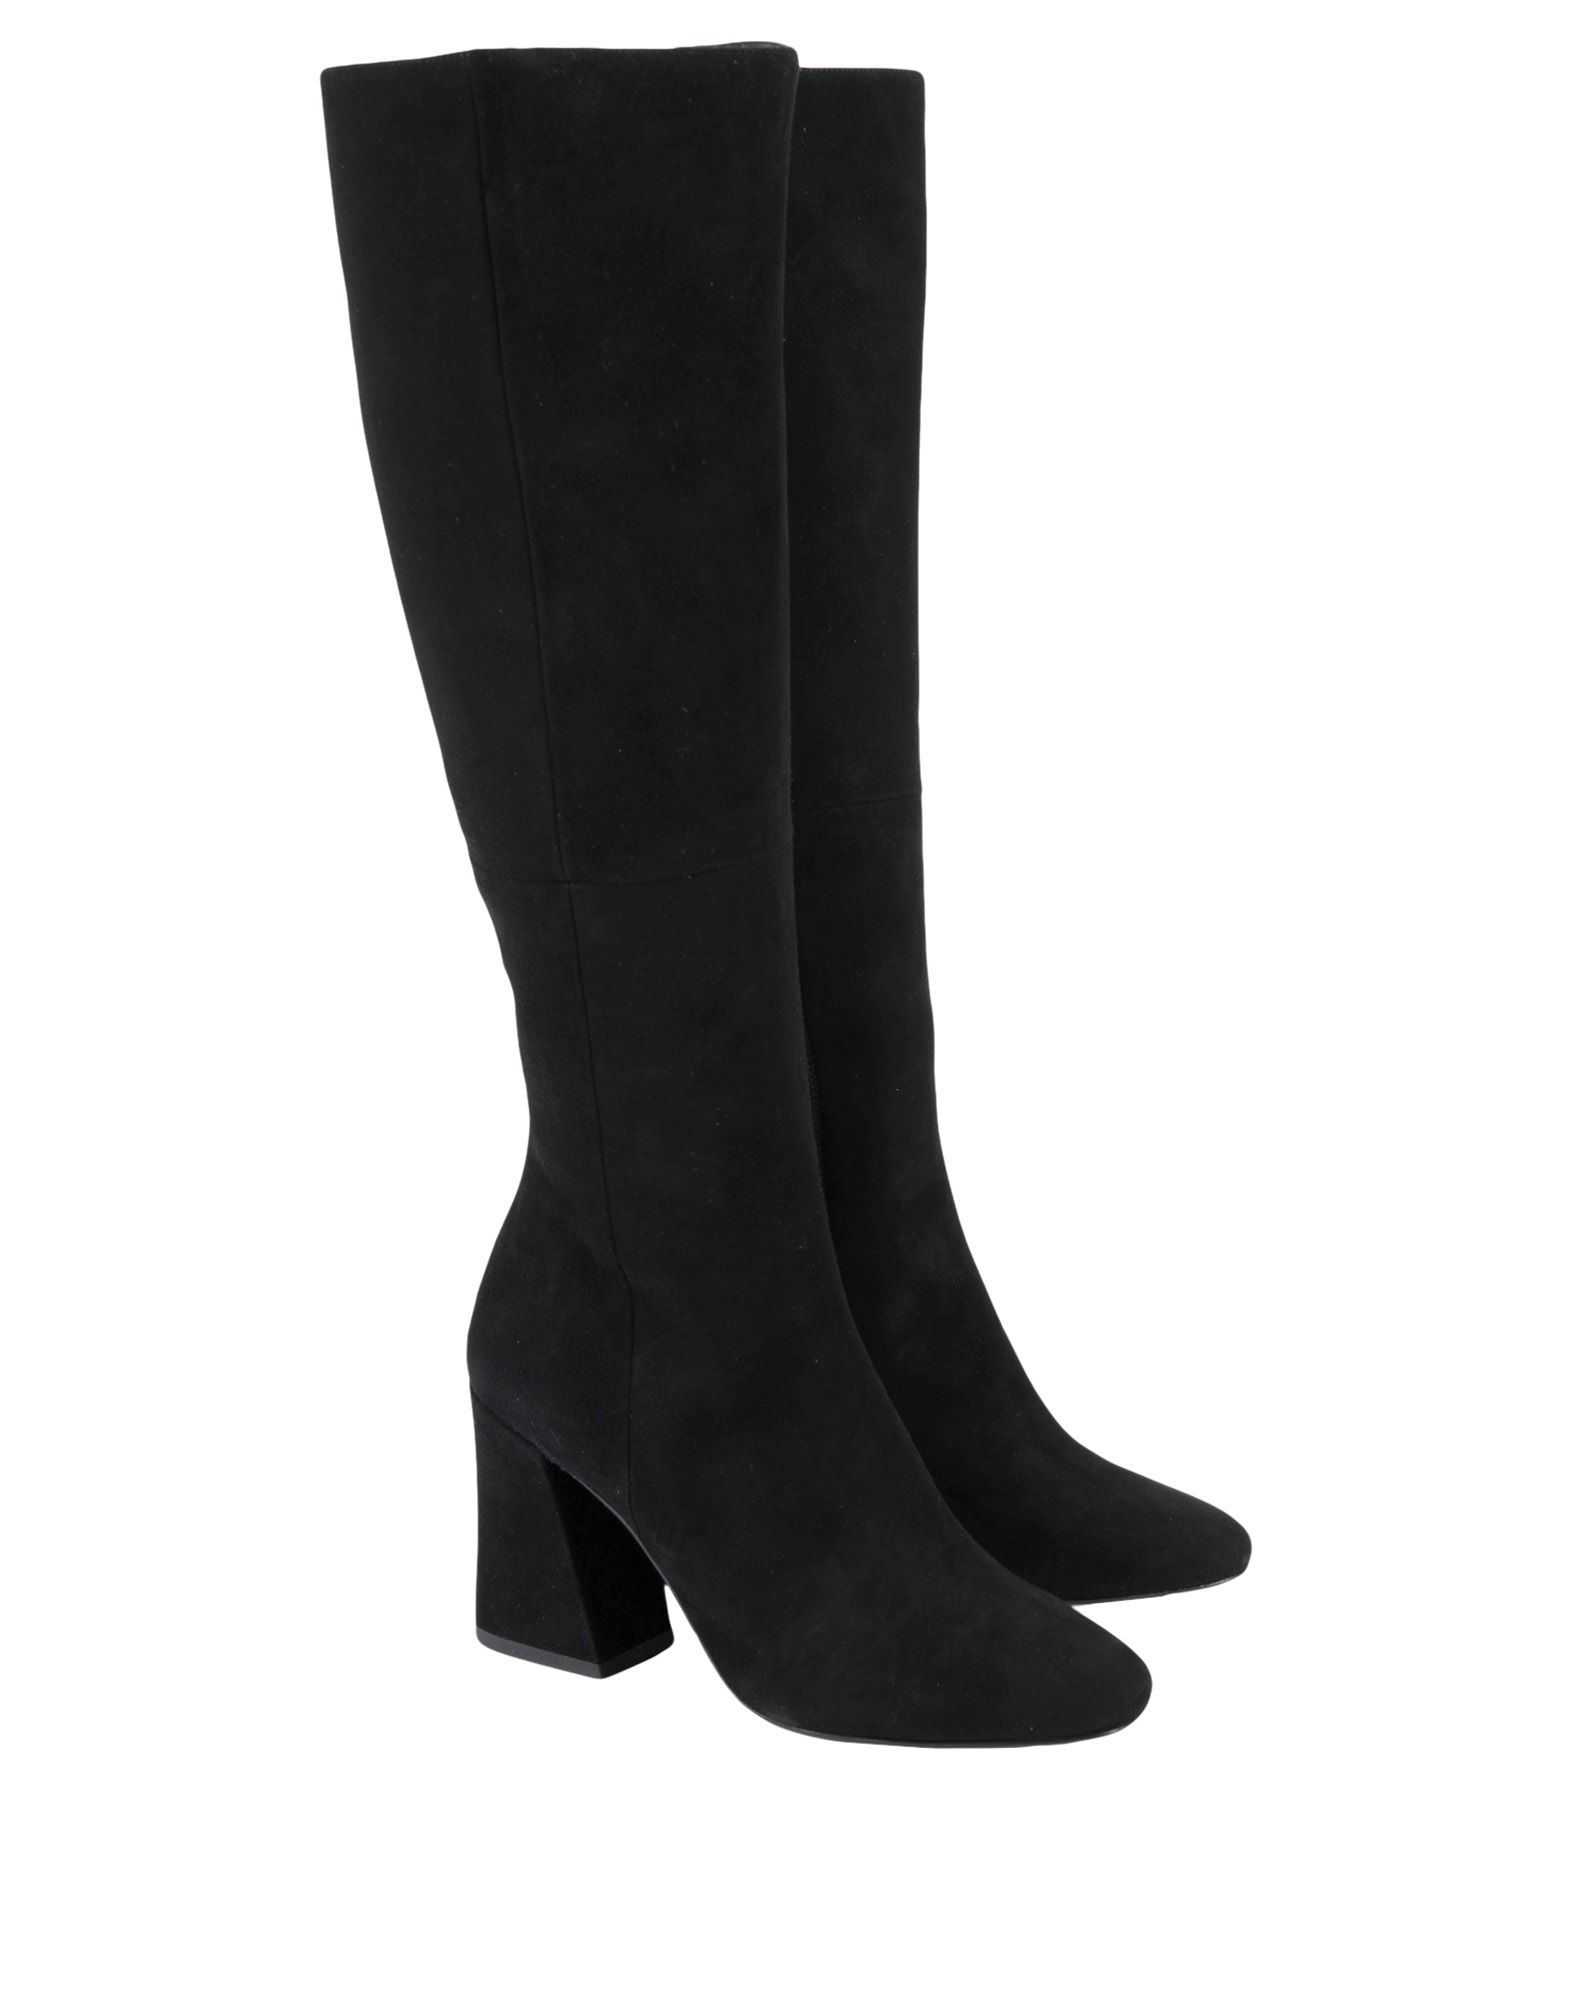 Stephen Good  London Stiefel Schuhe Damen  11533183JP Heiße Schuhe Stiefel ba9f9e